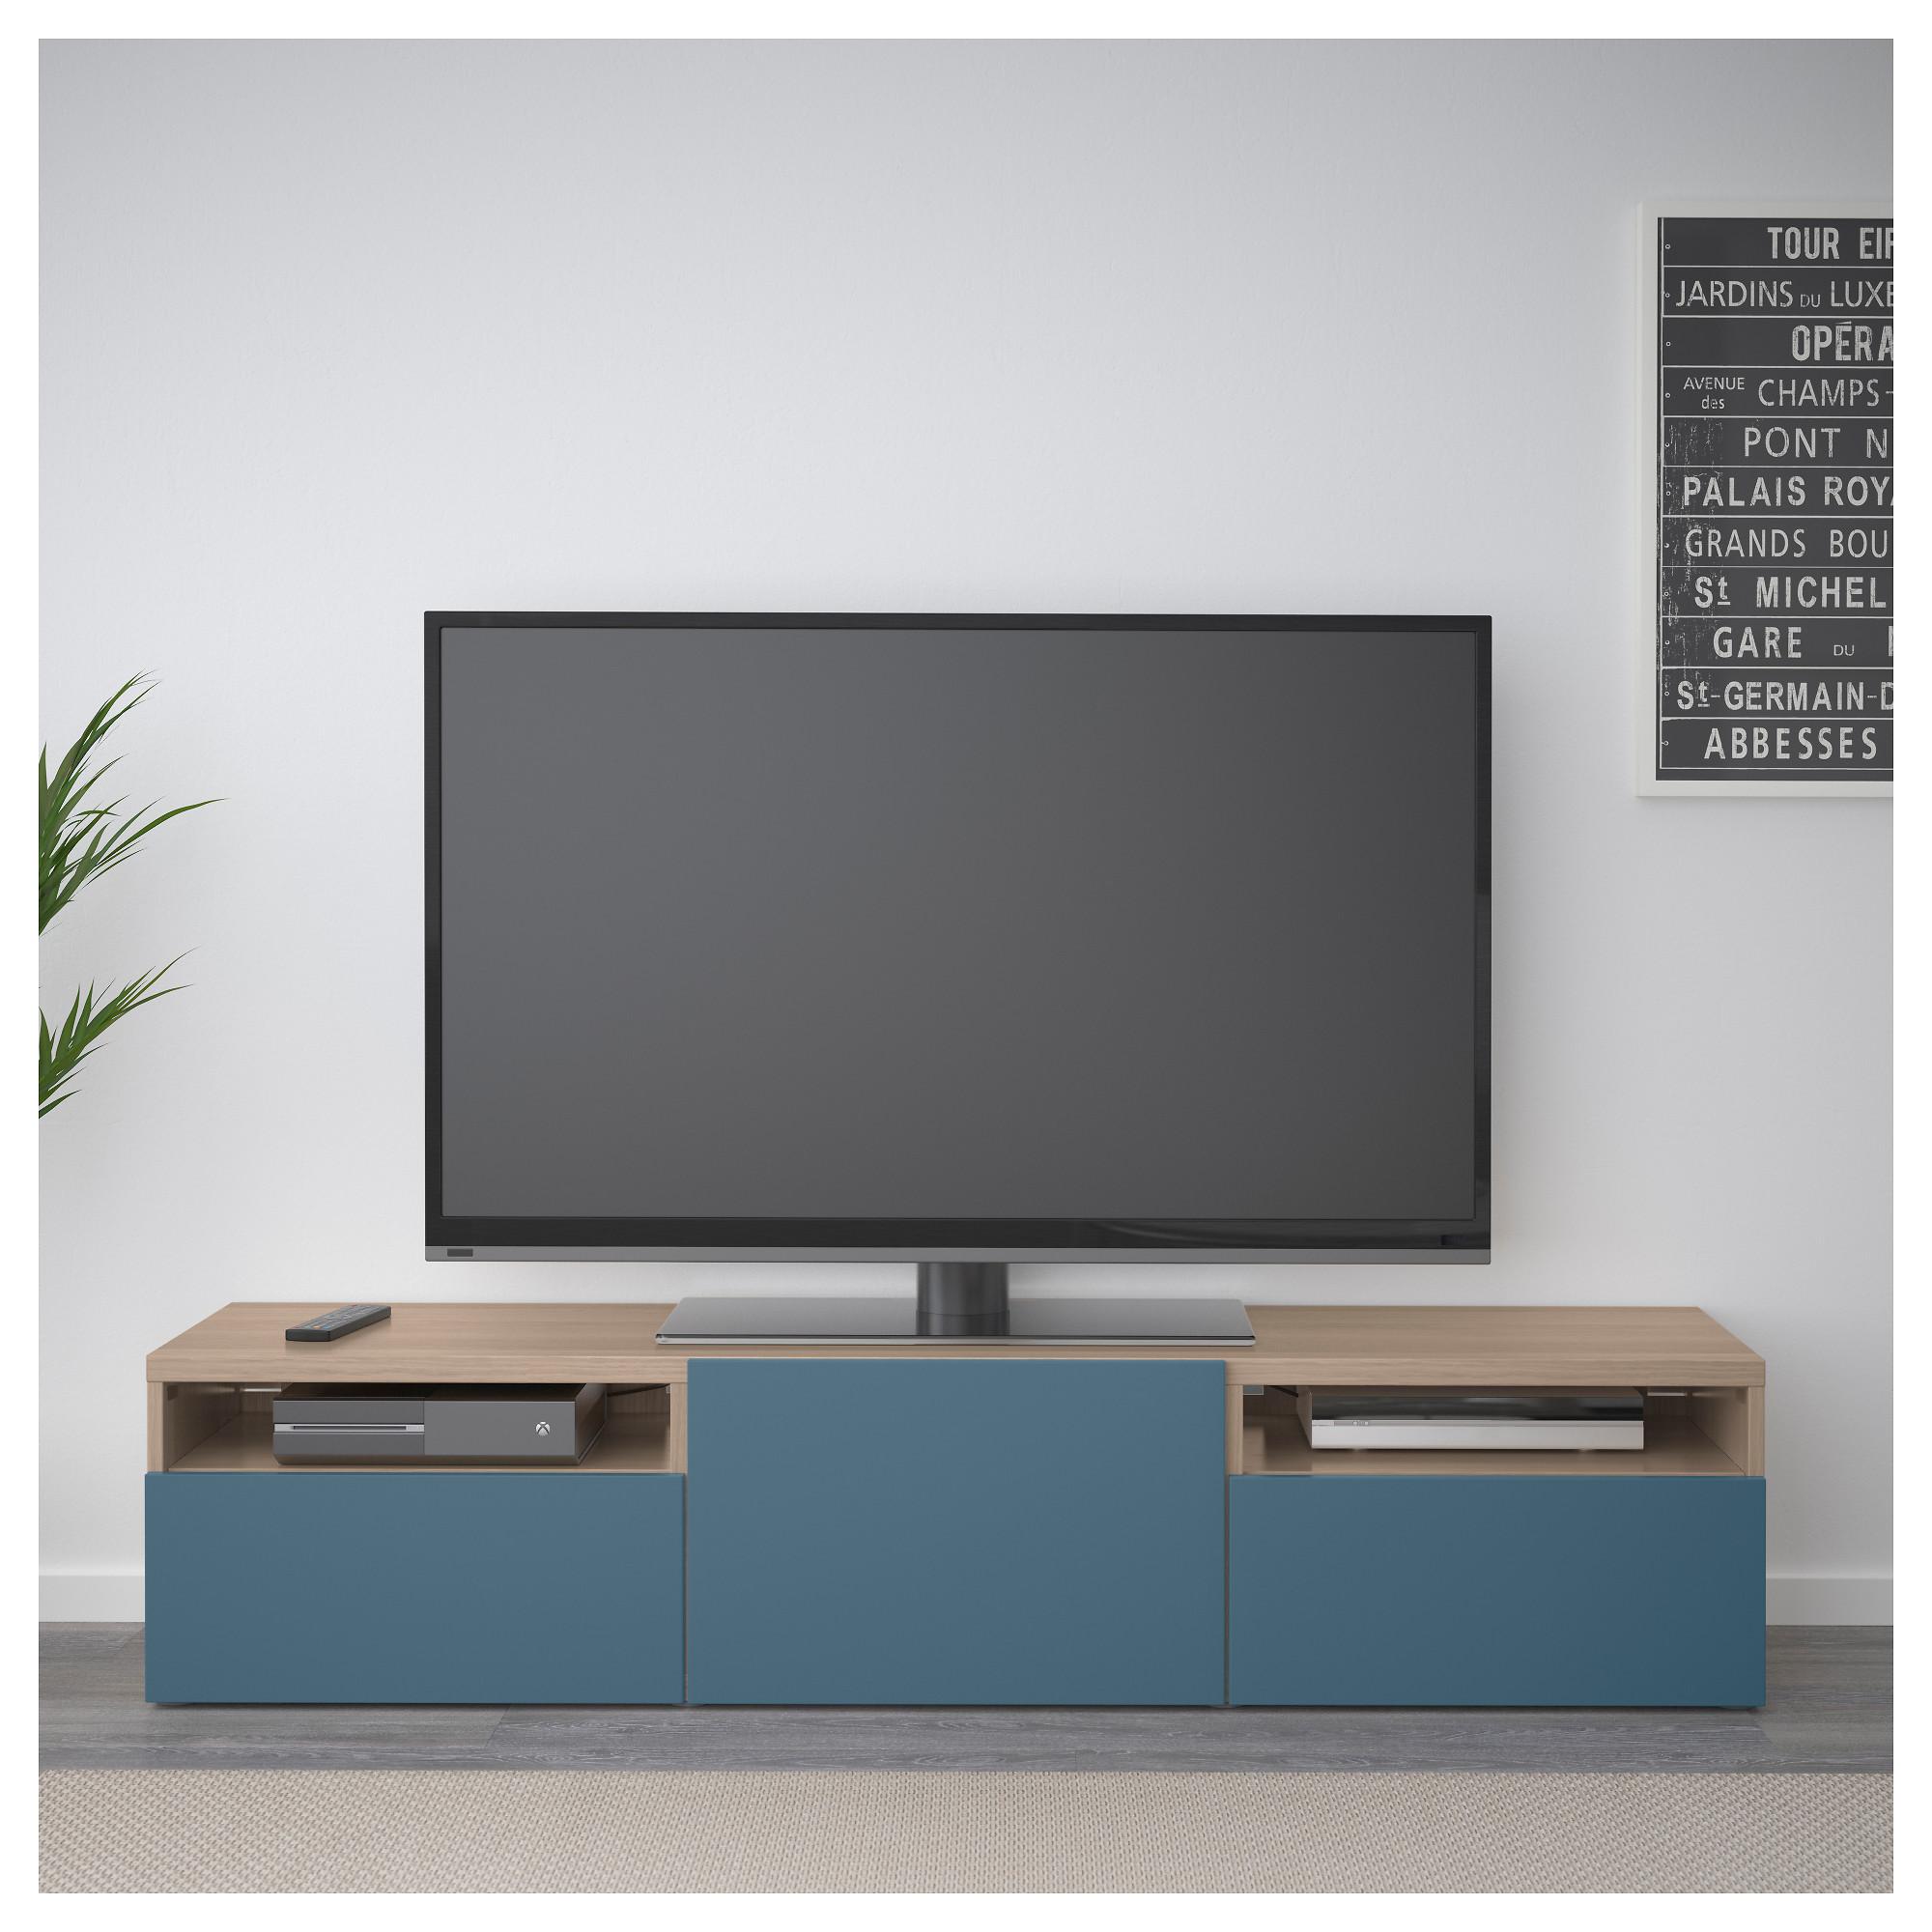 Тумба для ТВ с ящиками БЕСТО темно-синий артикуль № 692.503.36 в наличии. Online каталог IKEA Минск. Недорогая доставка и монтаж.